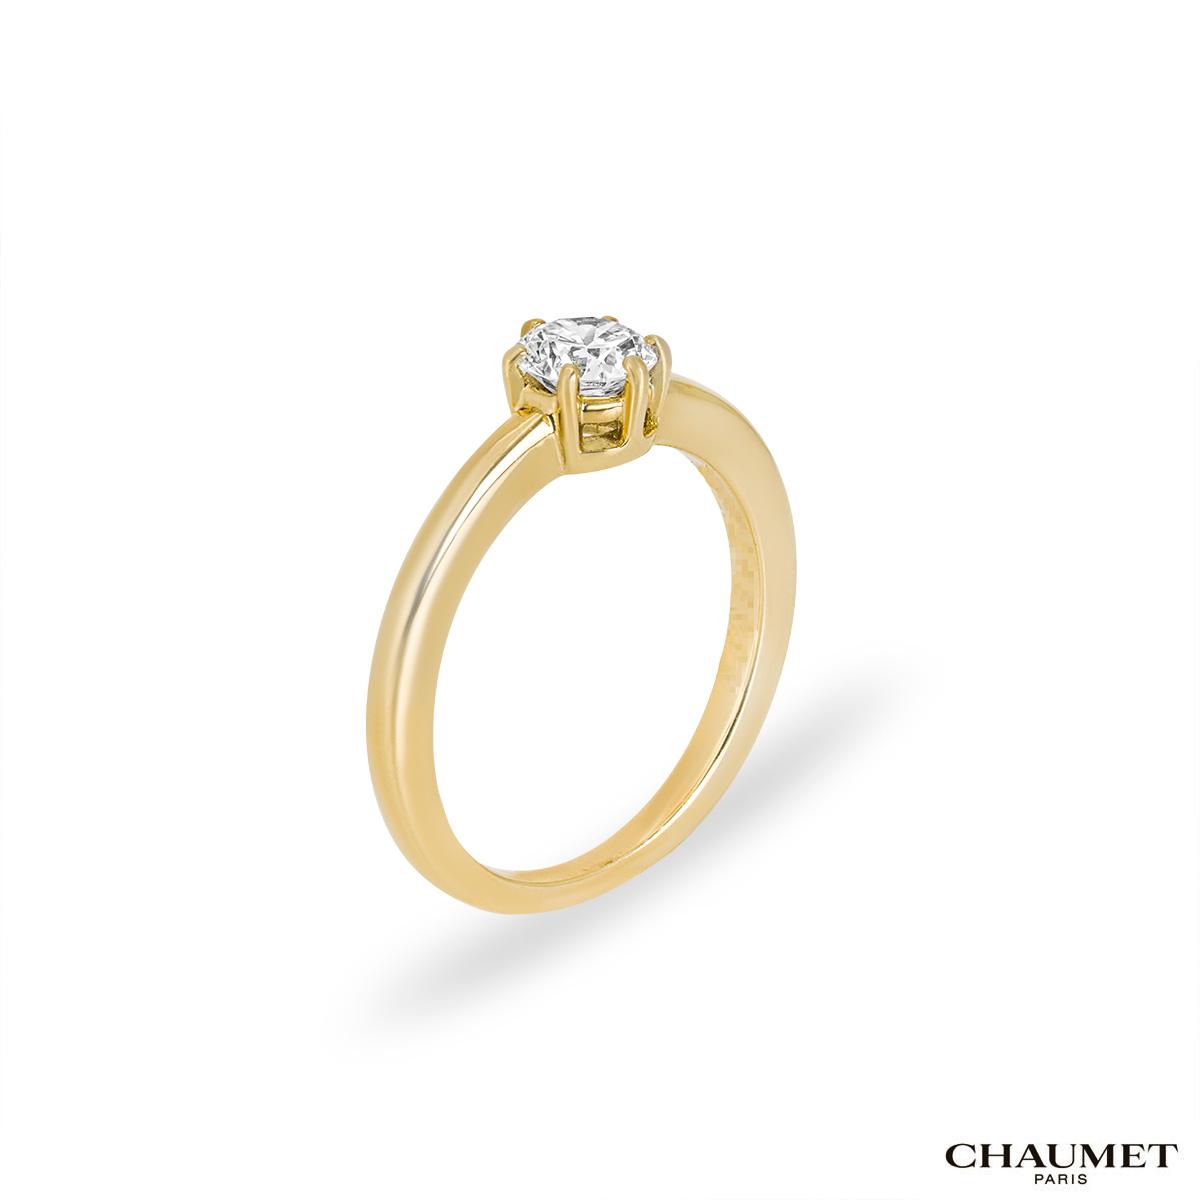 Chaumet Round Brilliant Cut Diamond Ring